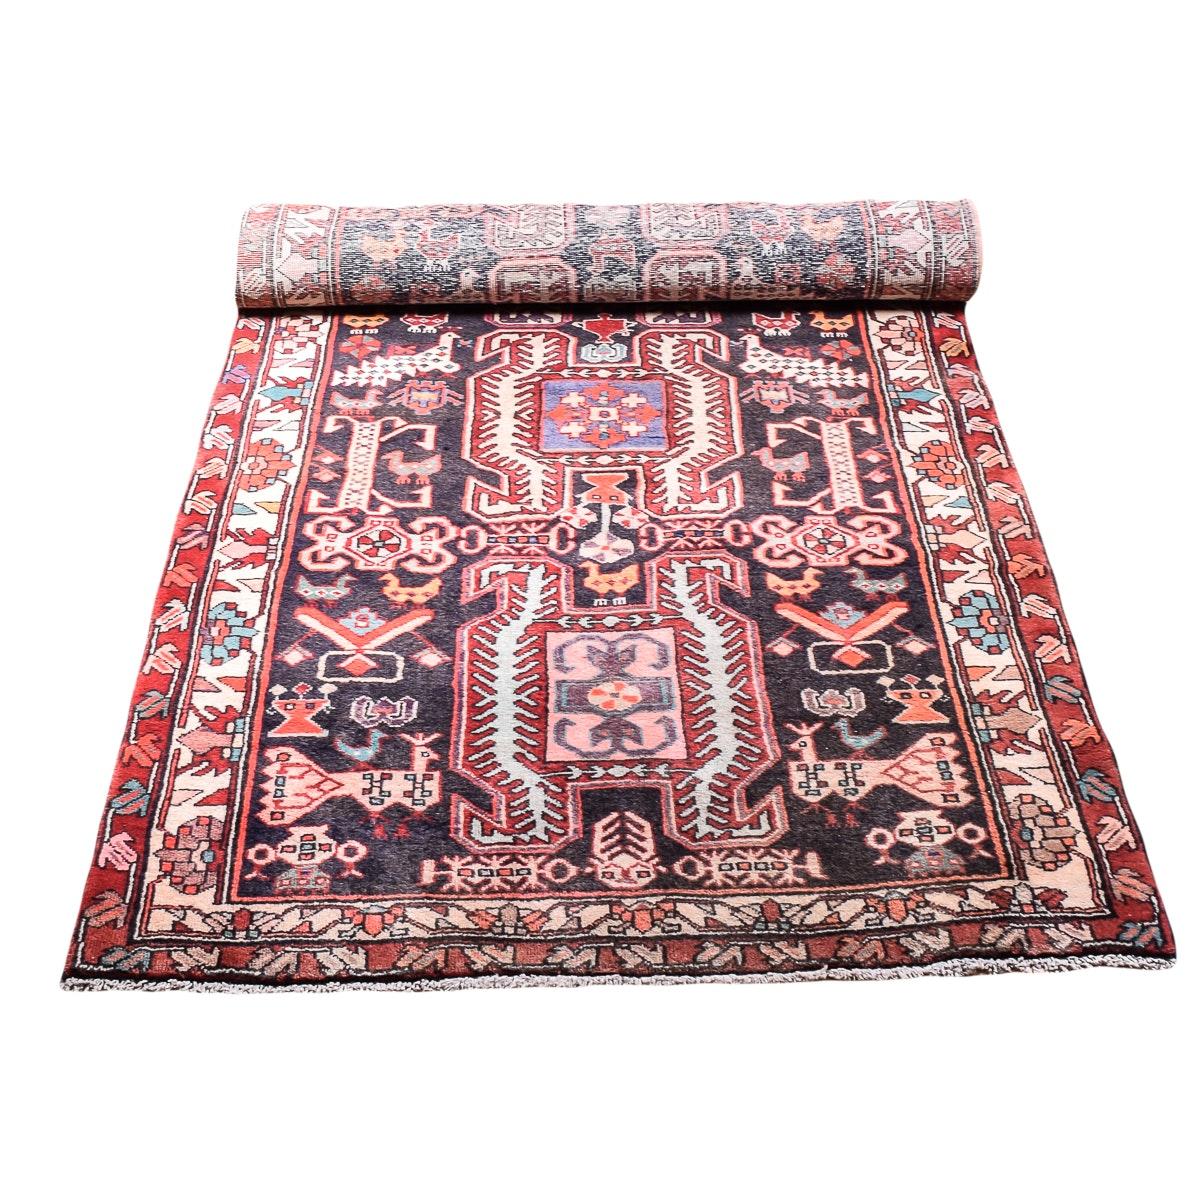 Vintage Handwoven Persian Carpet Runner